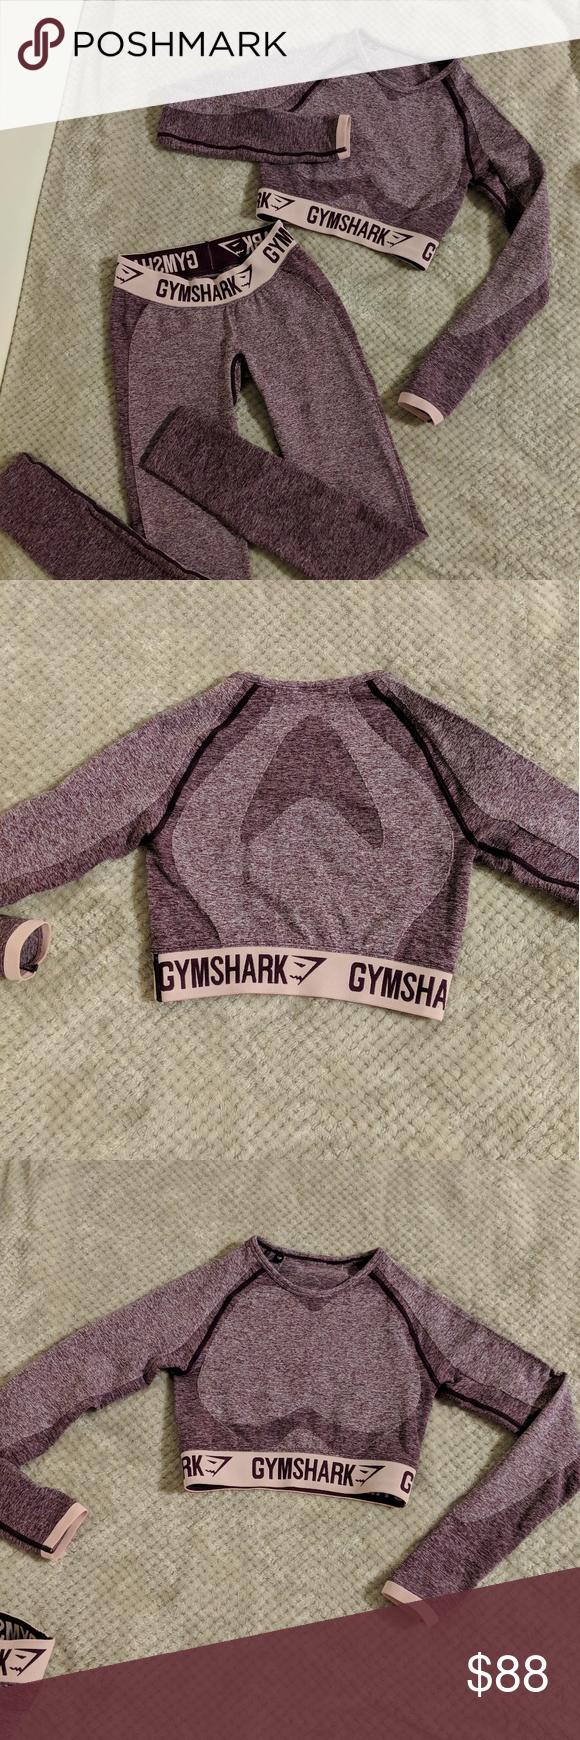 64a00eb2dac91 Advertisement; Gymshark Flex set: dark ruby marl/ blush nude Long sleeve  crop top. Full